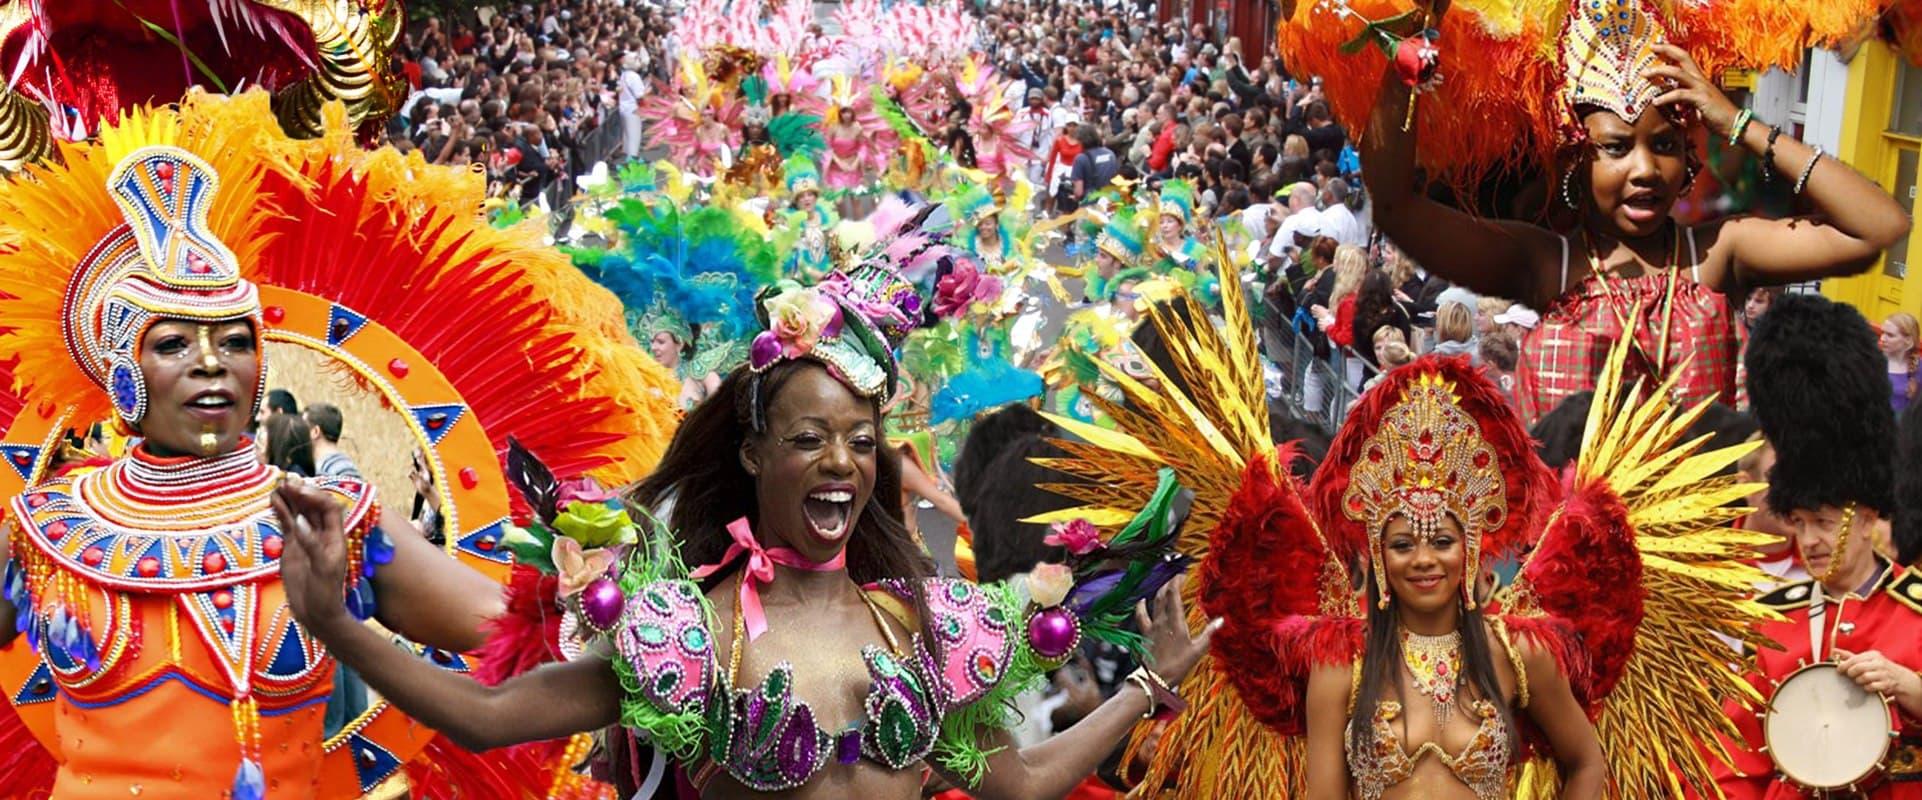 Festival Frolicks: Notting Hill Carnival